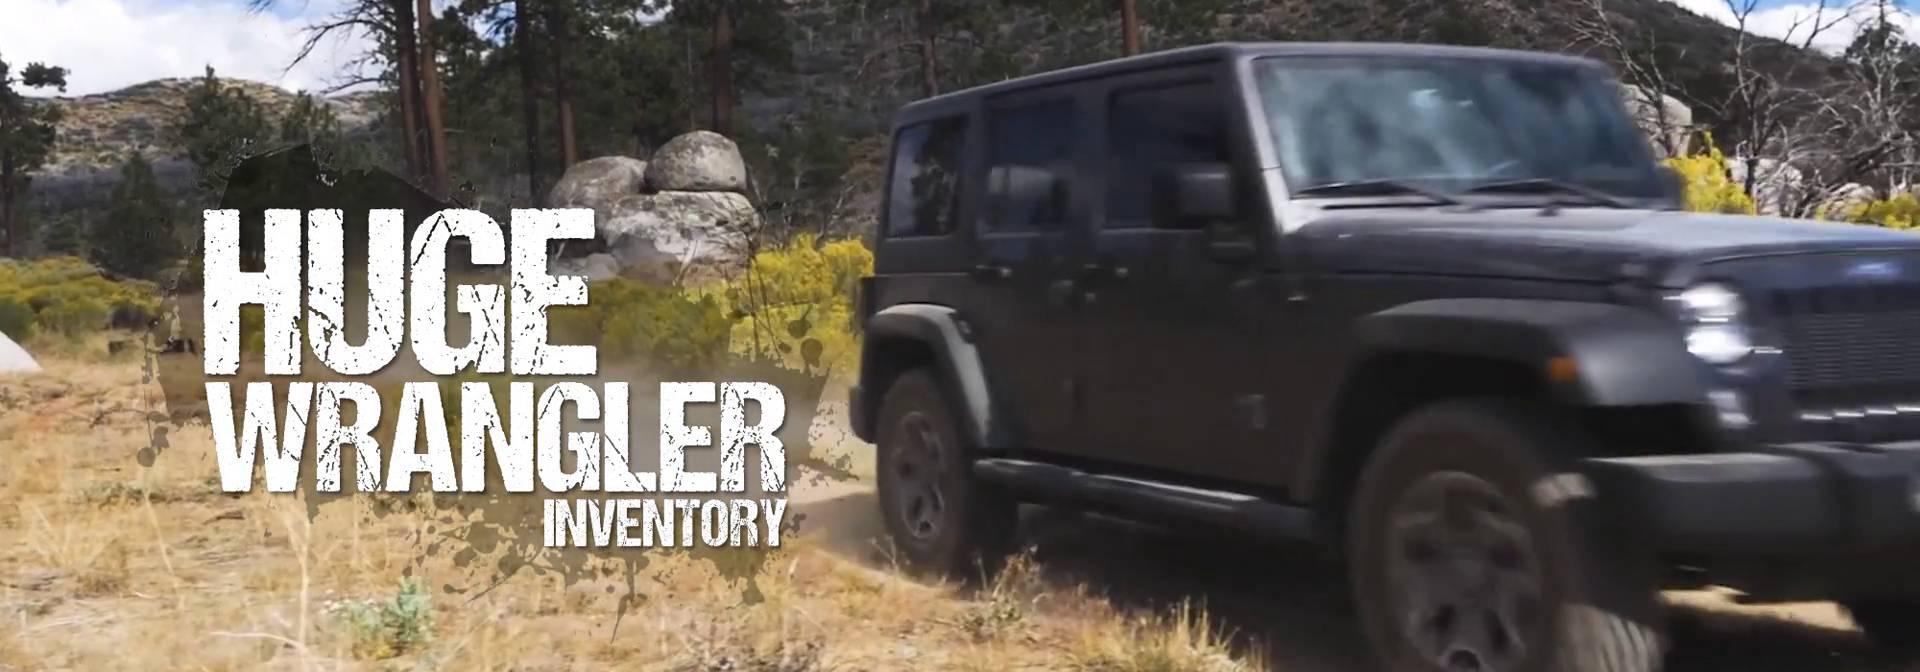 Looking For A New Jeep Wrangler Vehicles Near Ottawa   Capital Dodge | Chrysler  Jeep U0026 Dodge Dealer In Ottawa